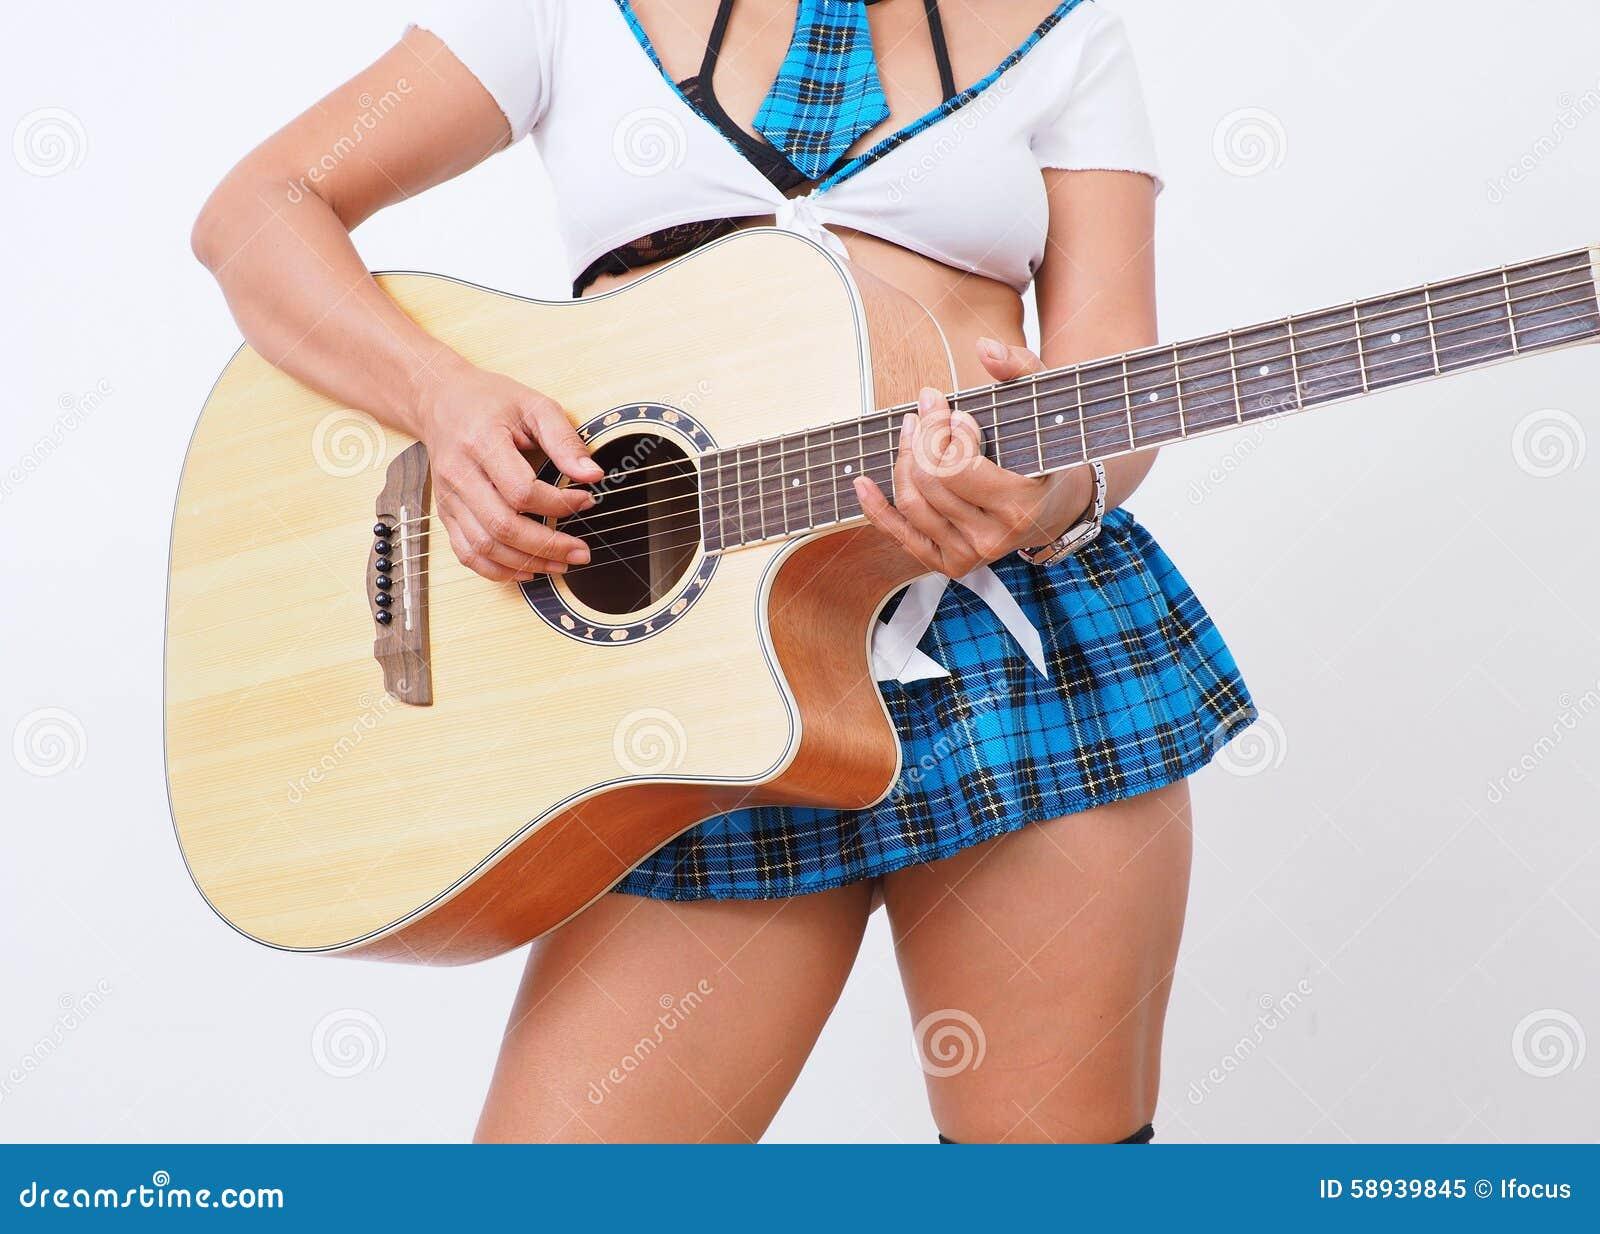 79c52c96a97ee5 La Jupe Micro De Femme Sexy Joue La Guitare Image stock - Image du ...